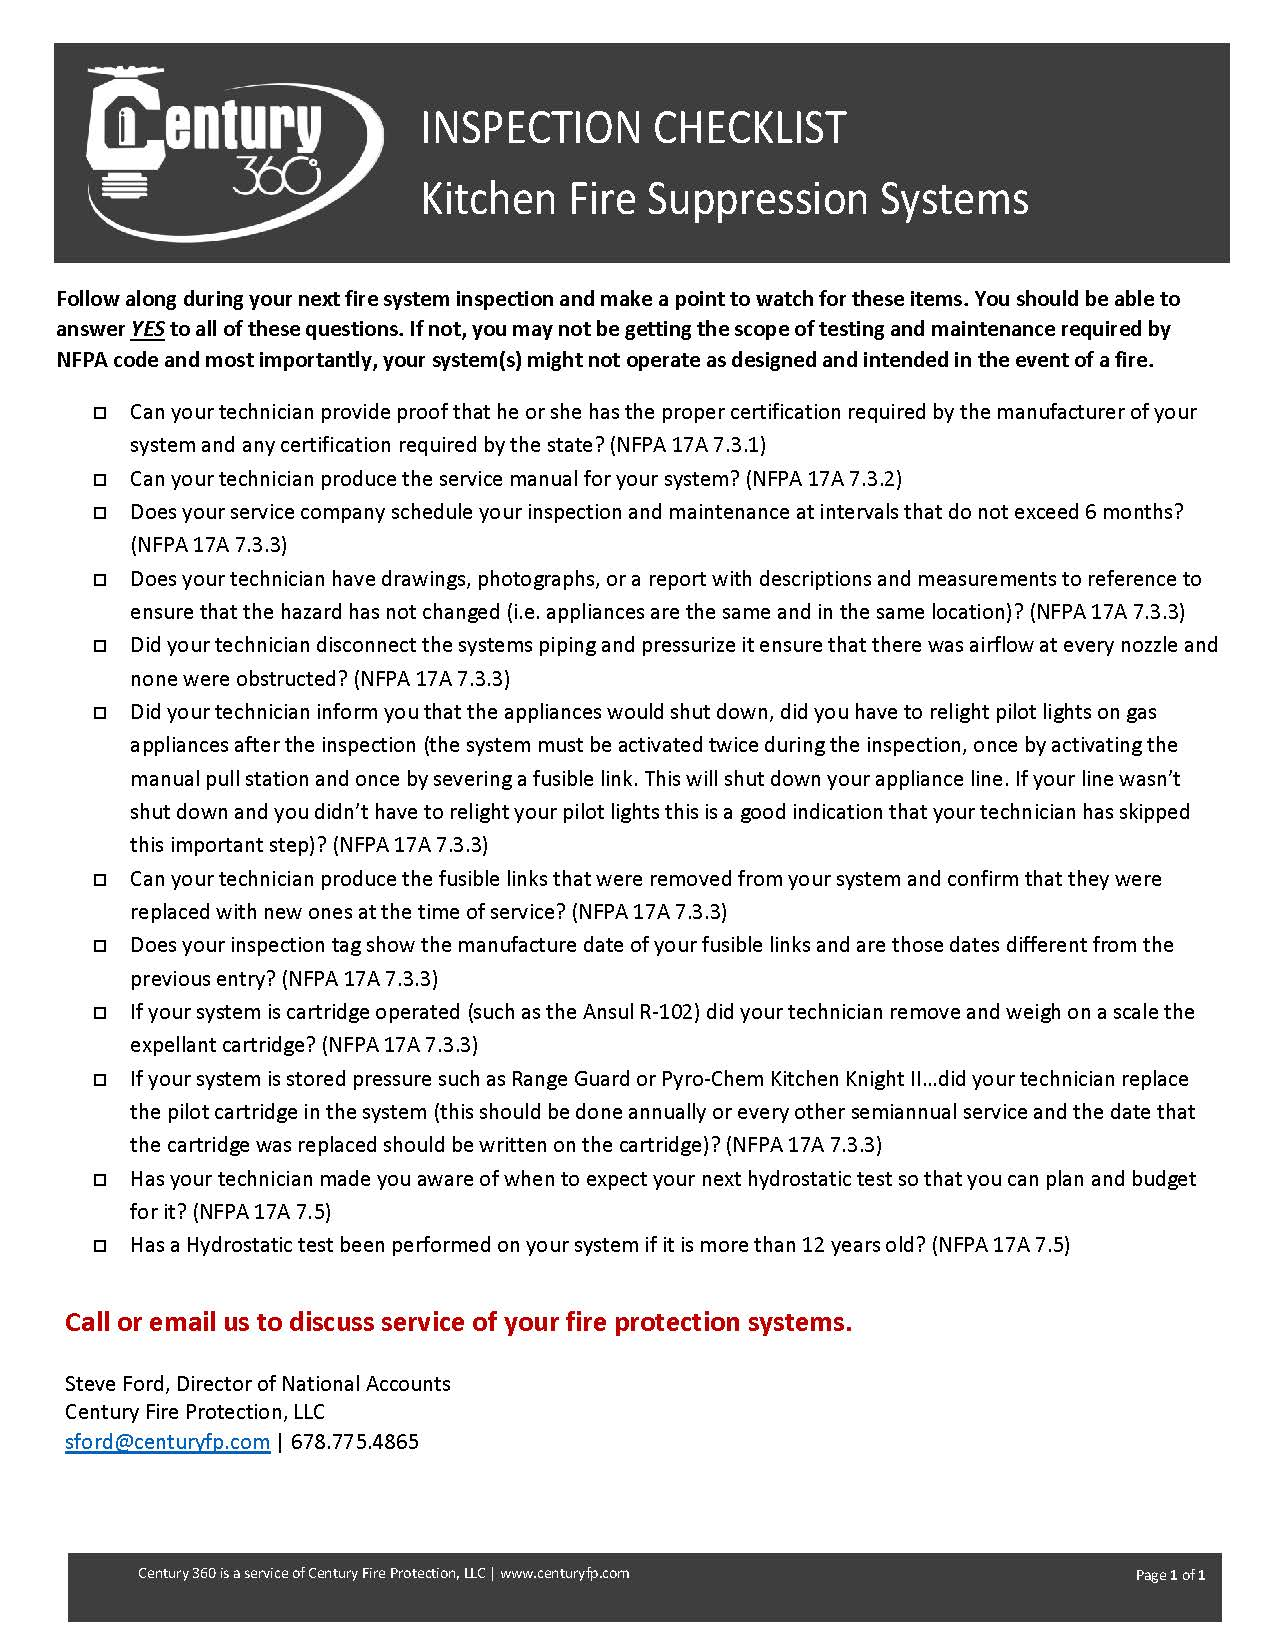 Content_Offer_-_Kitchen_System_Inspection_Checklist_FINAL.jpg